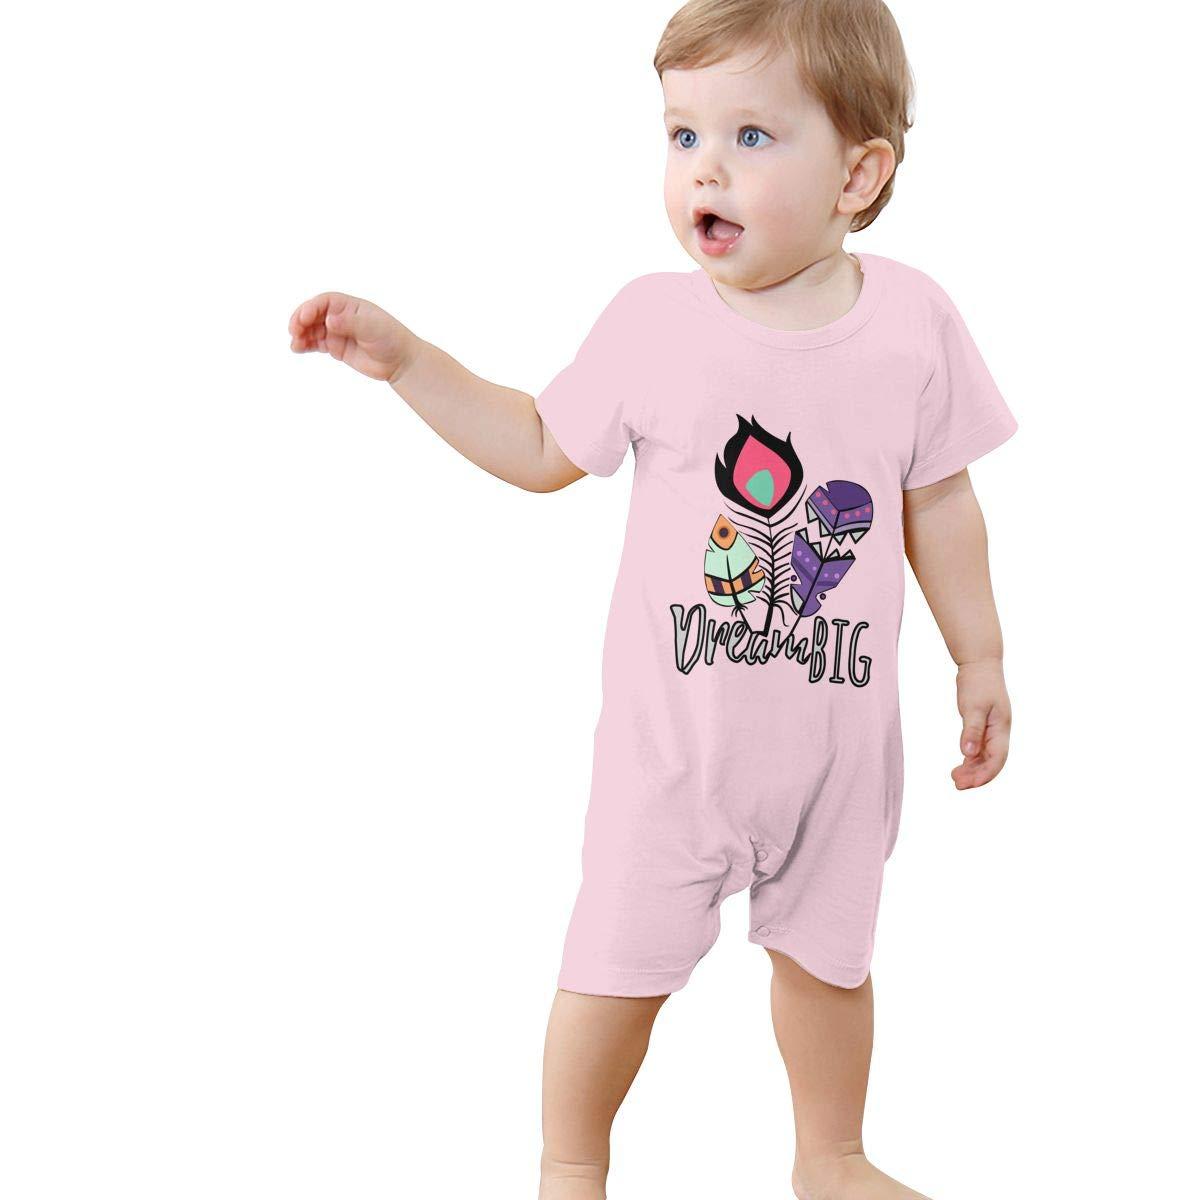 YINGFG Baby Boys Girls Short Sleeve Jumpsuit Dream Big Cotton Romper